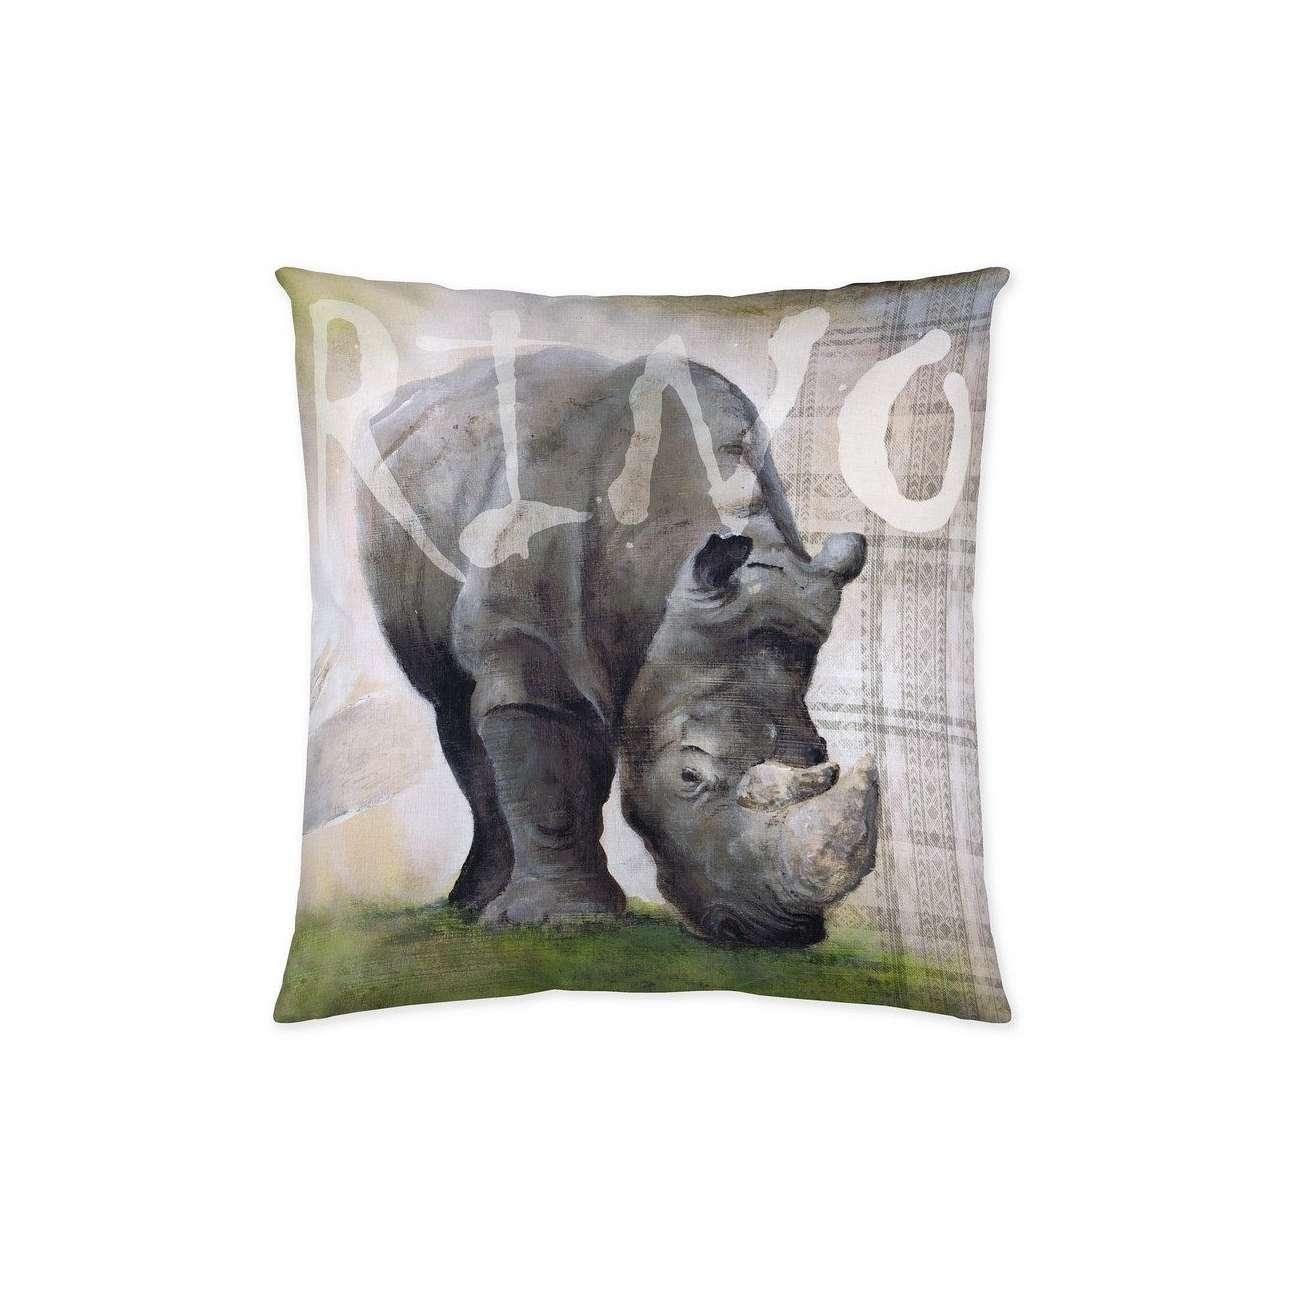 Kussenhoes Rhinoceros 45x45cm